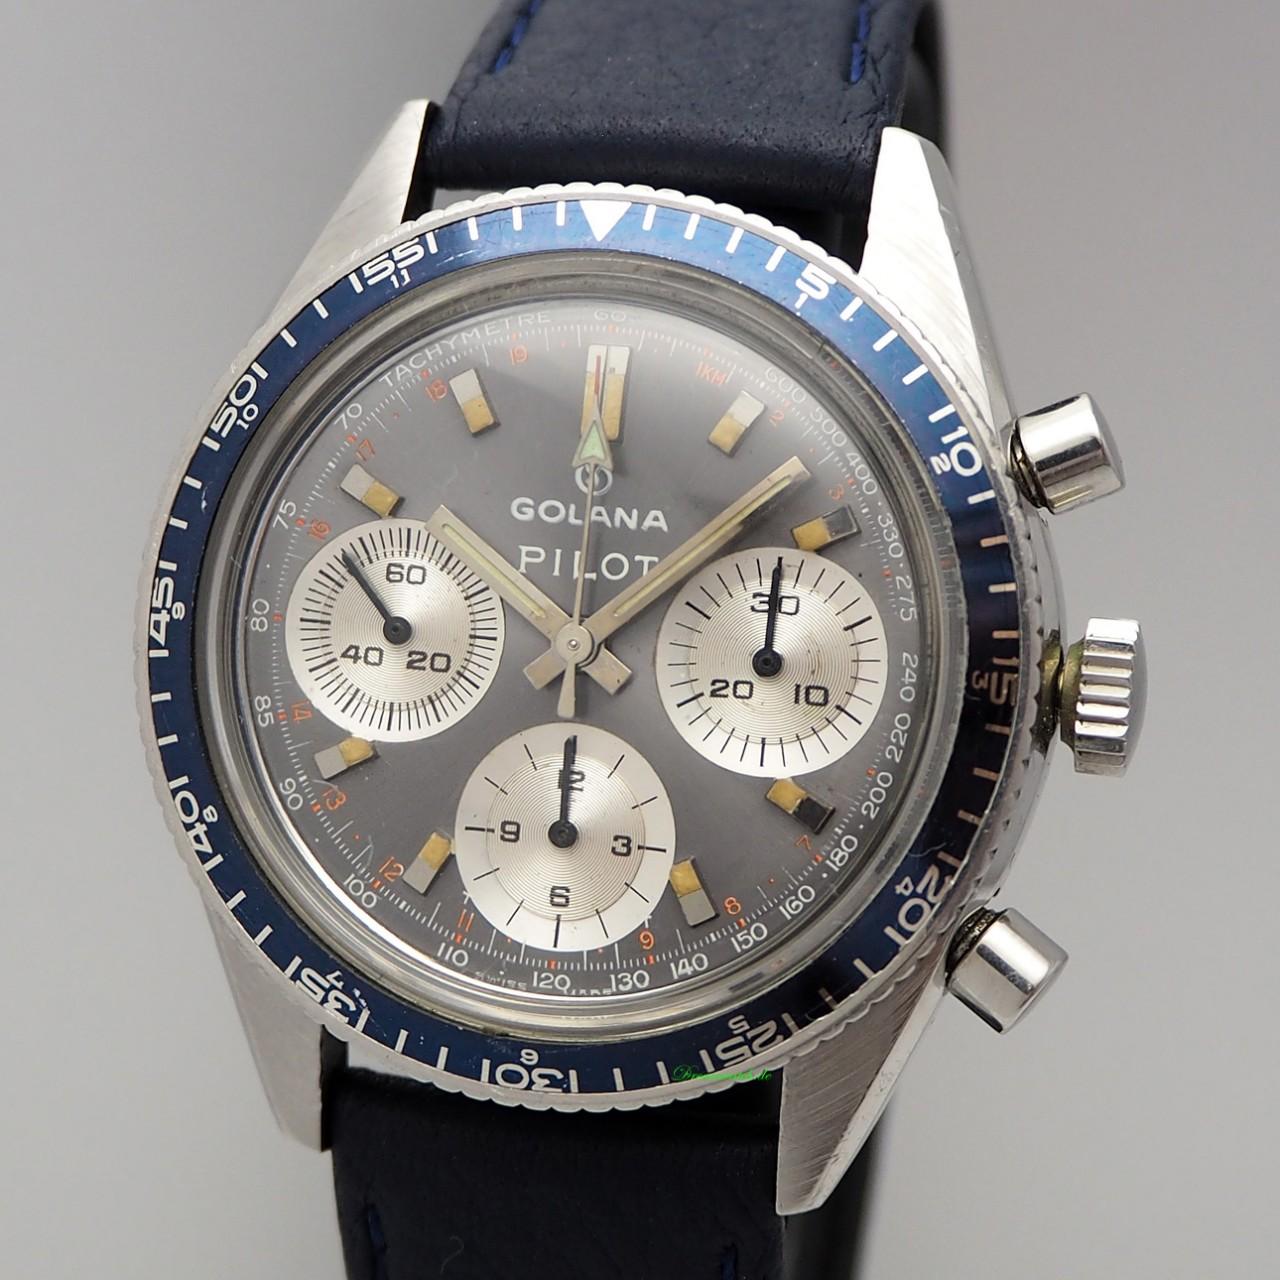 Golana Pilot Chronograph Valjoux 726 very rare